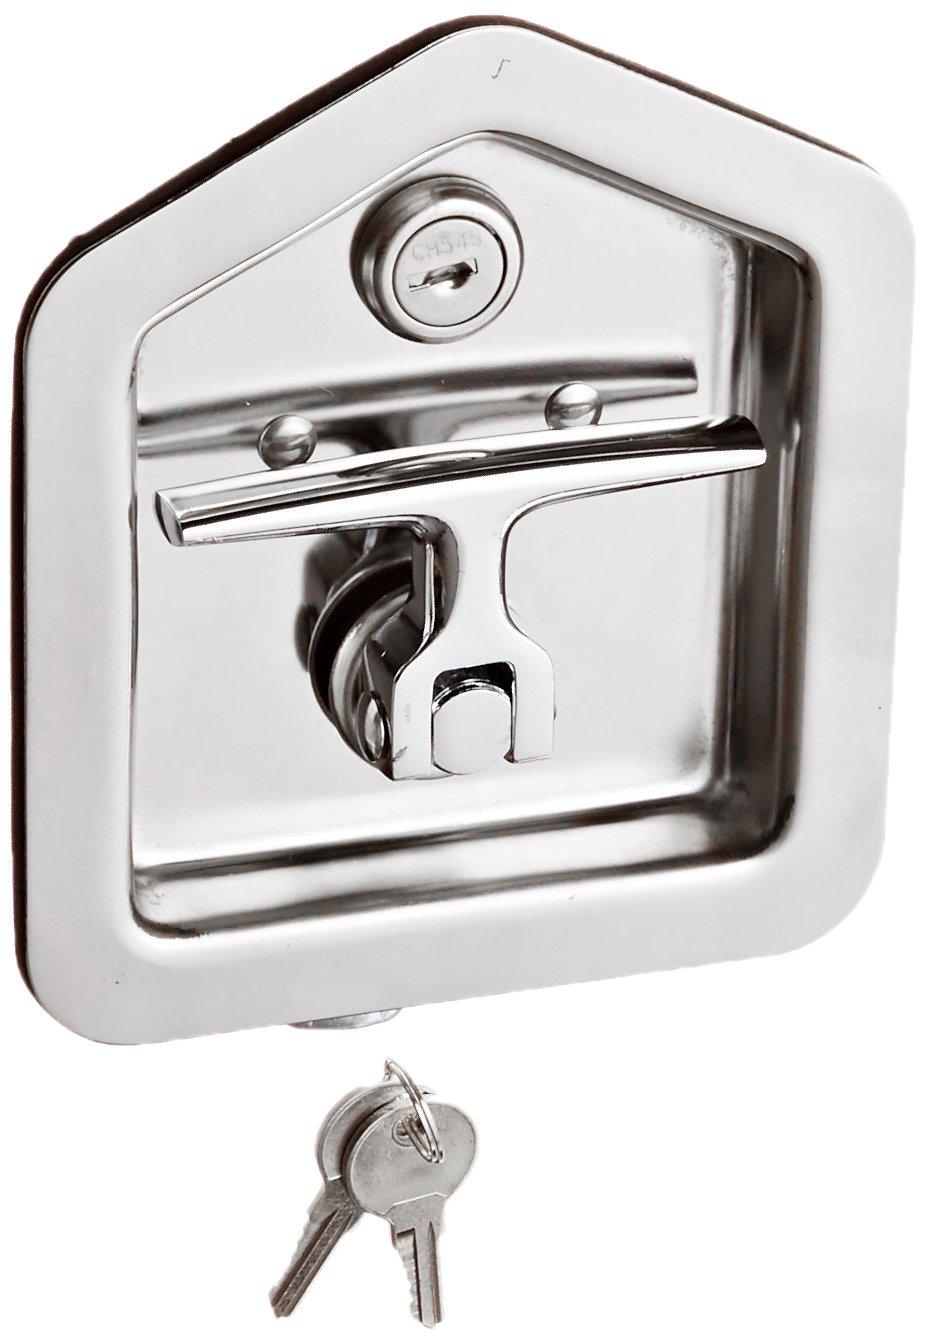 Amazon.com: Buyers Products L8816 Folding T-Handle Latch: Automotive